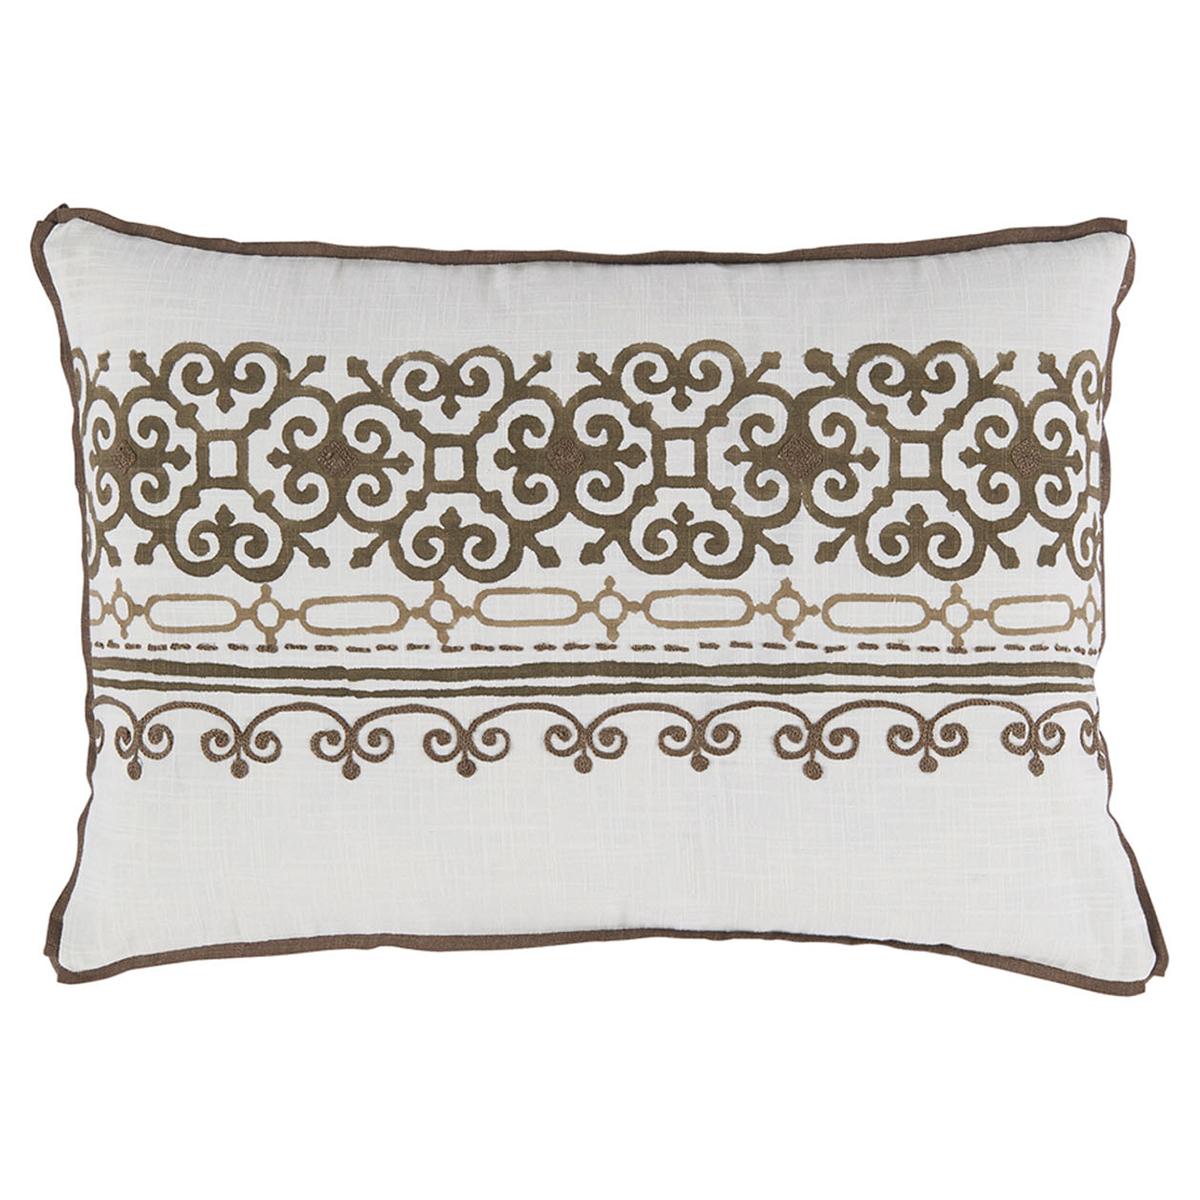 Lamont French Heritage Scroll Motif Brown Pillow - 13x19